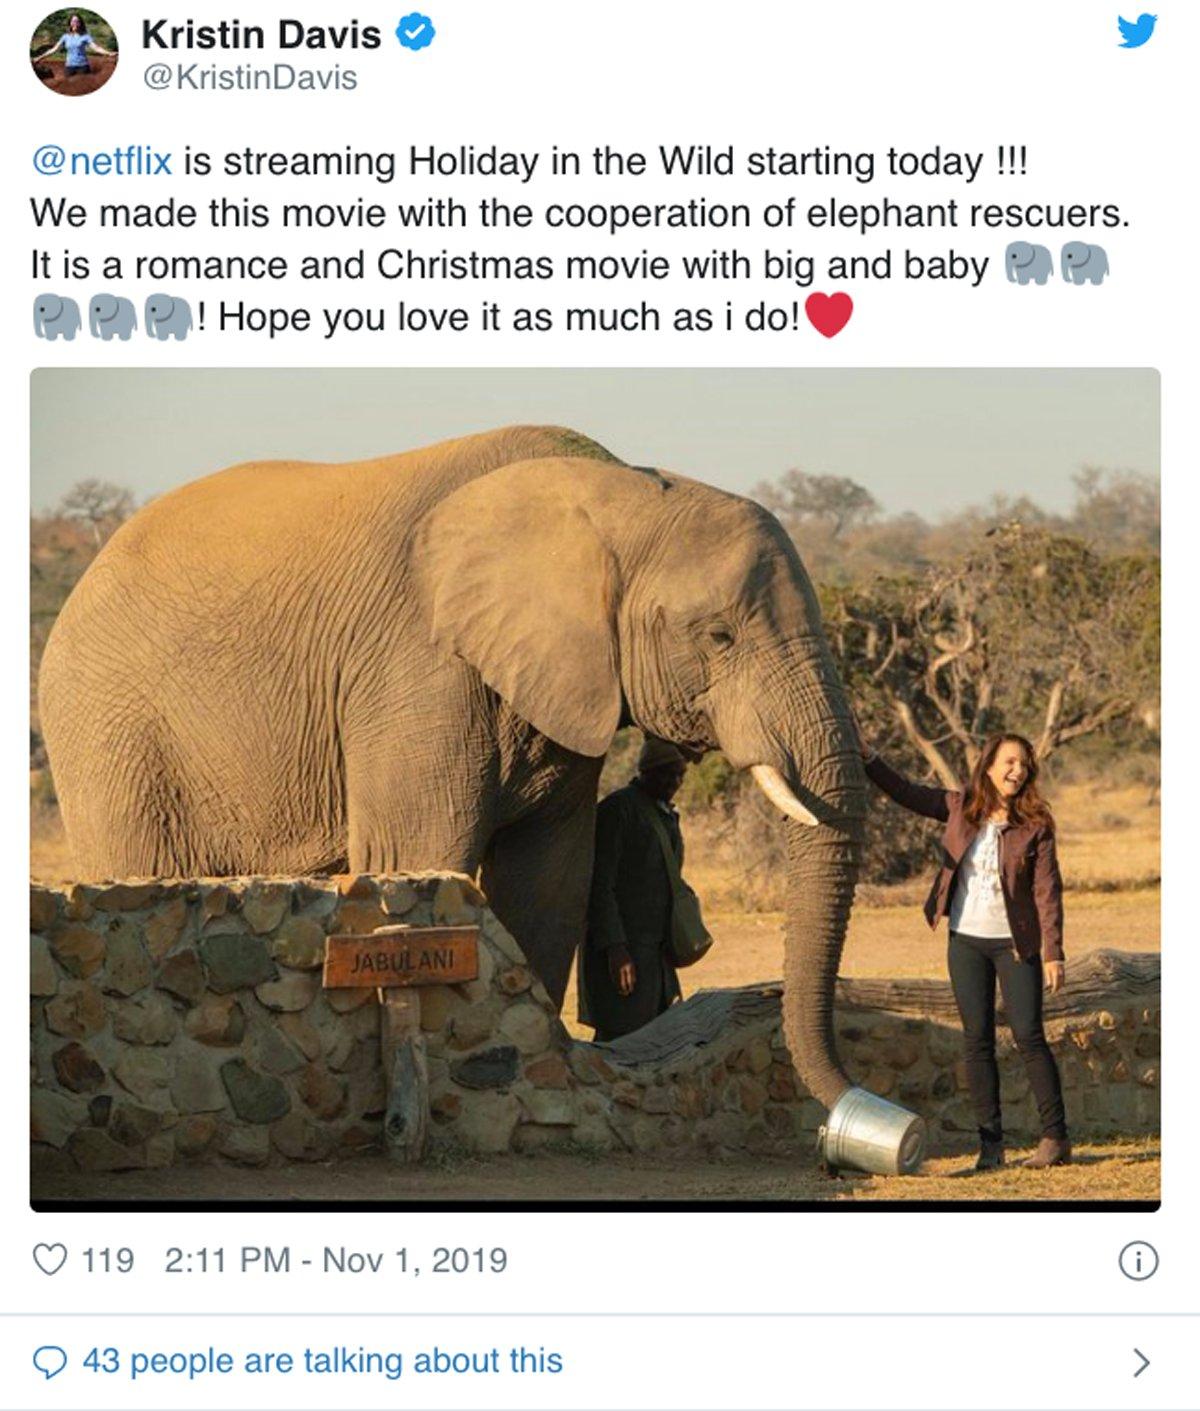 Kristin Davis elephant work on Twitter